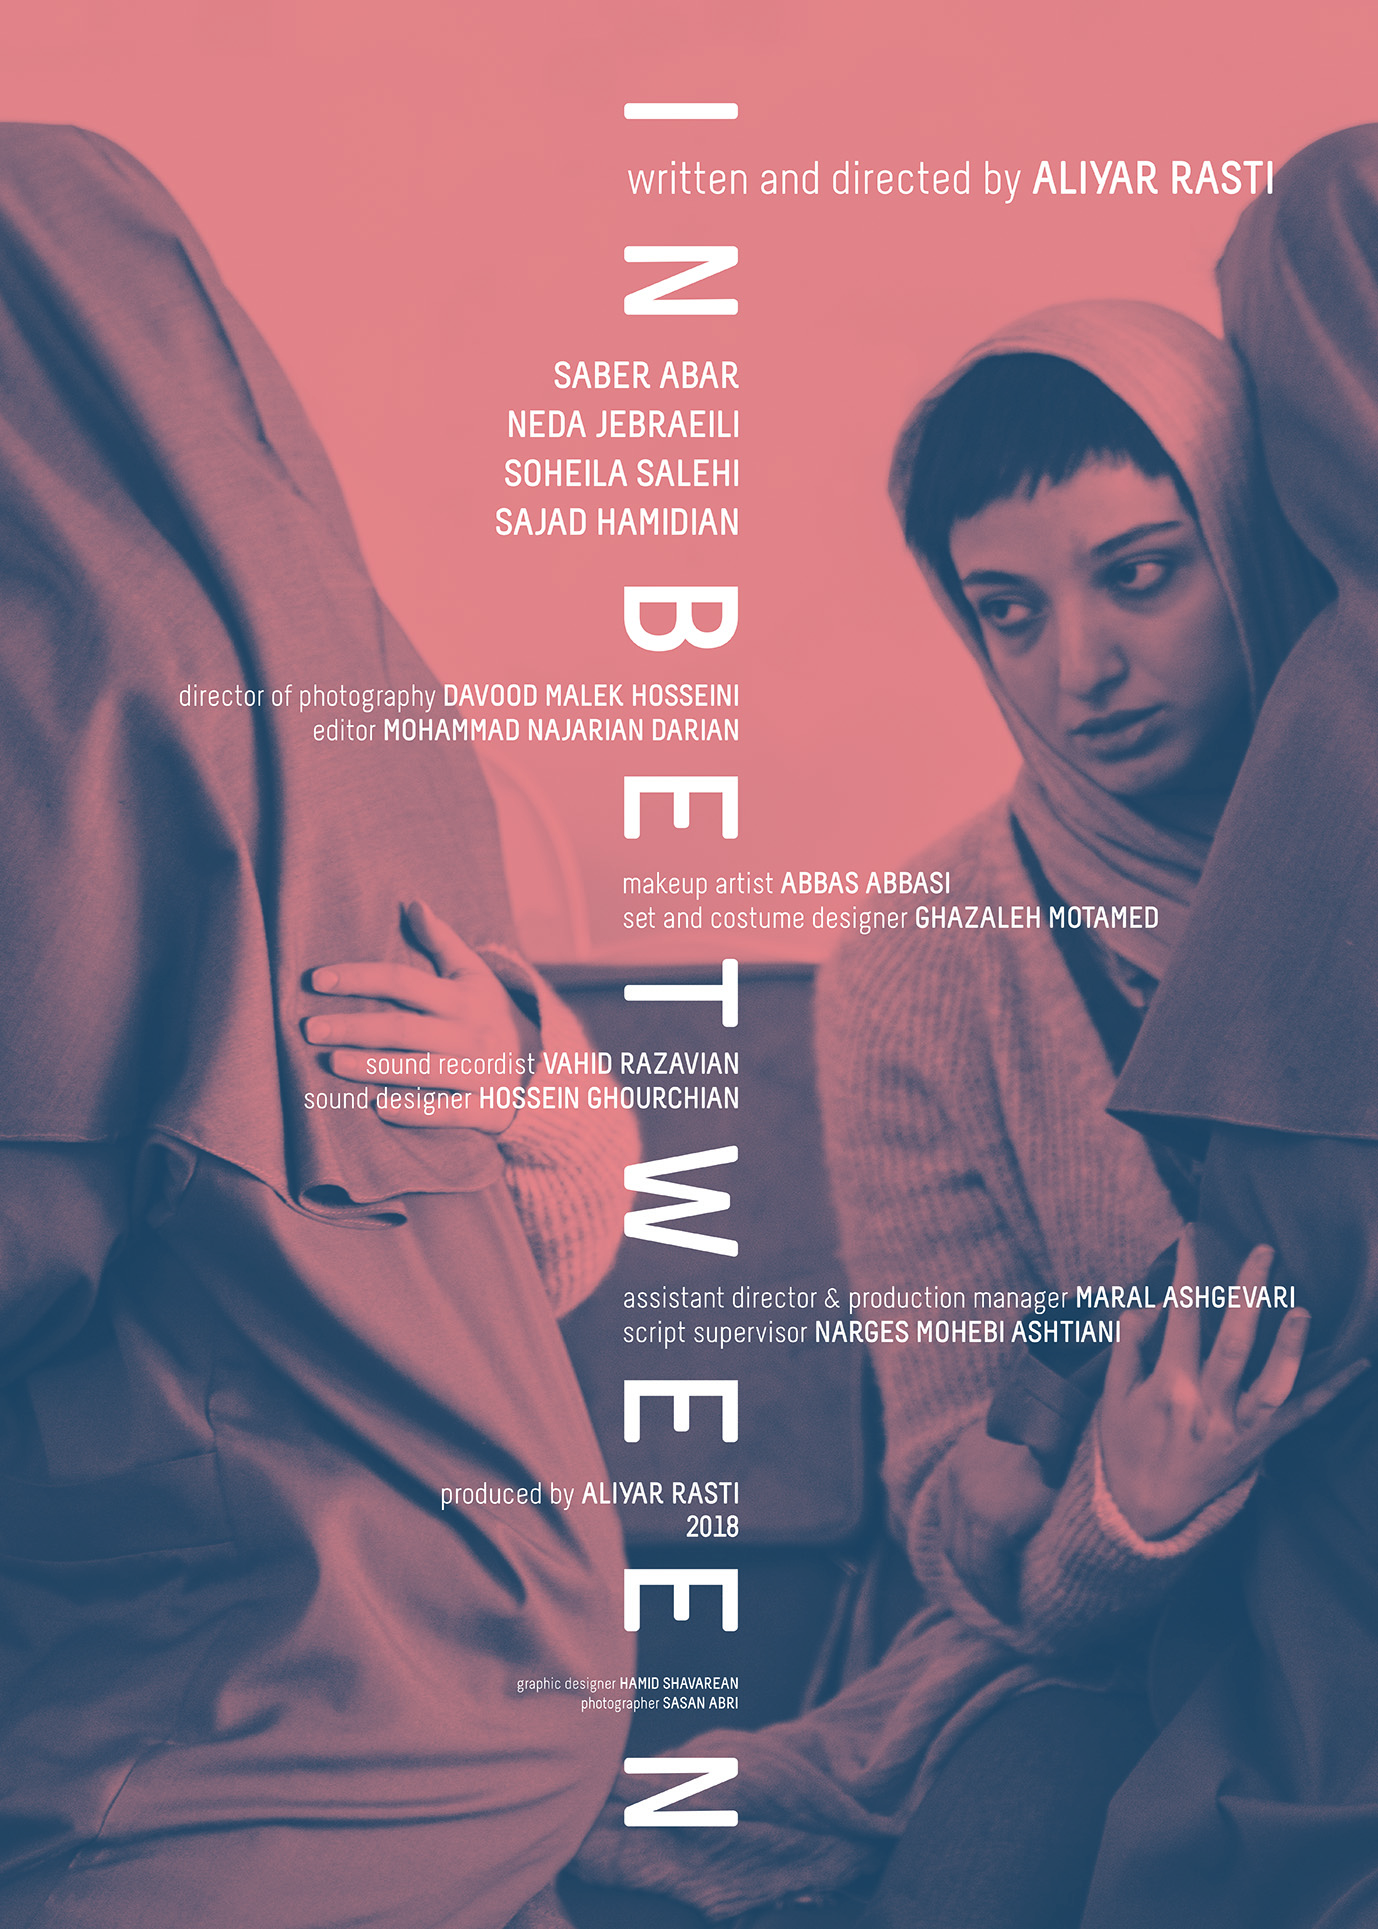 Saber Abar, Neda Jebraeili, Aliyar Rasti, and Soheila Salehi in In Between (2018)